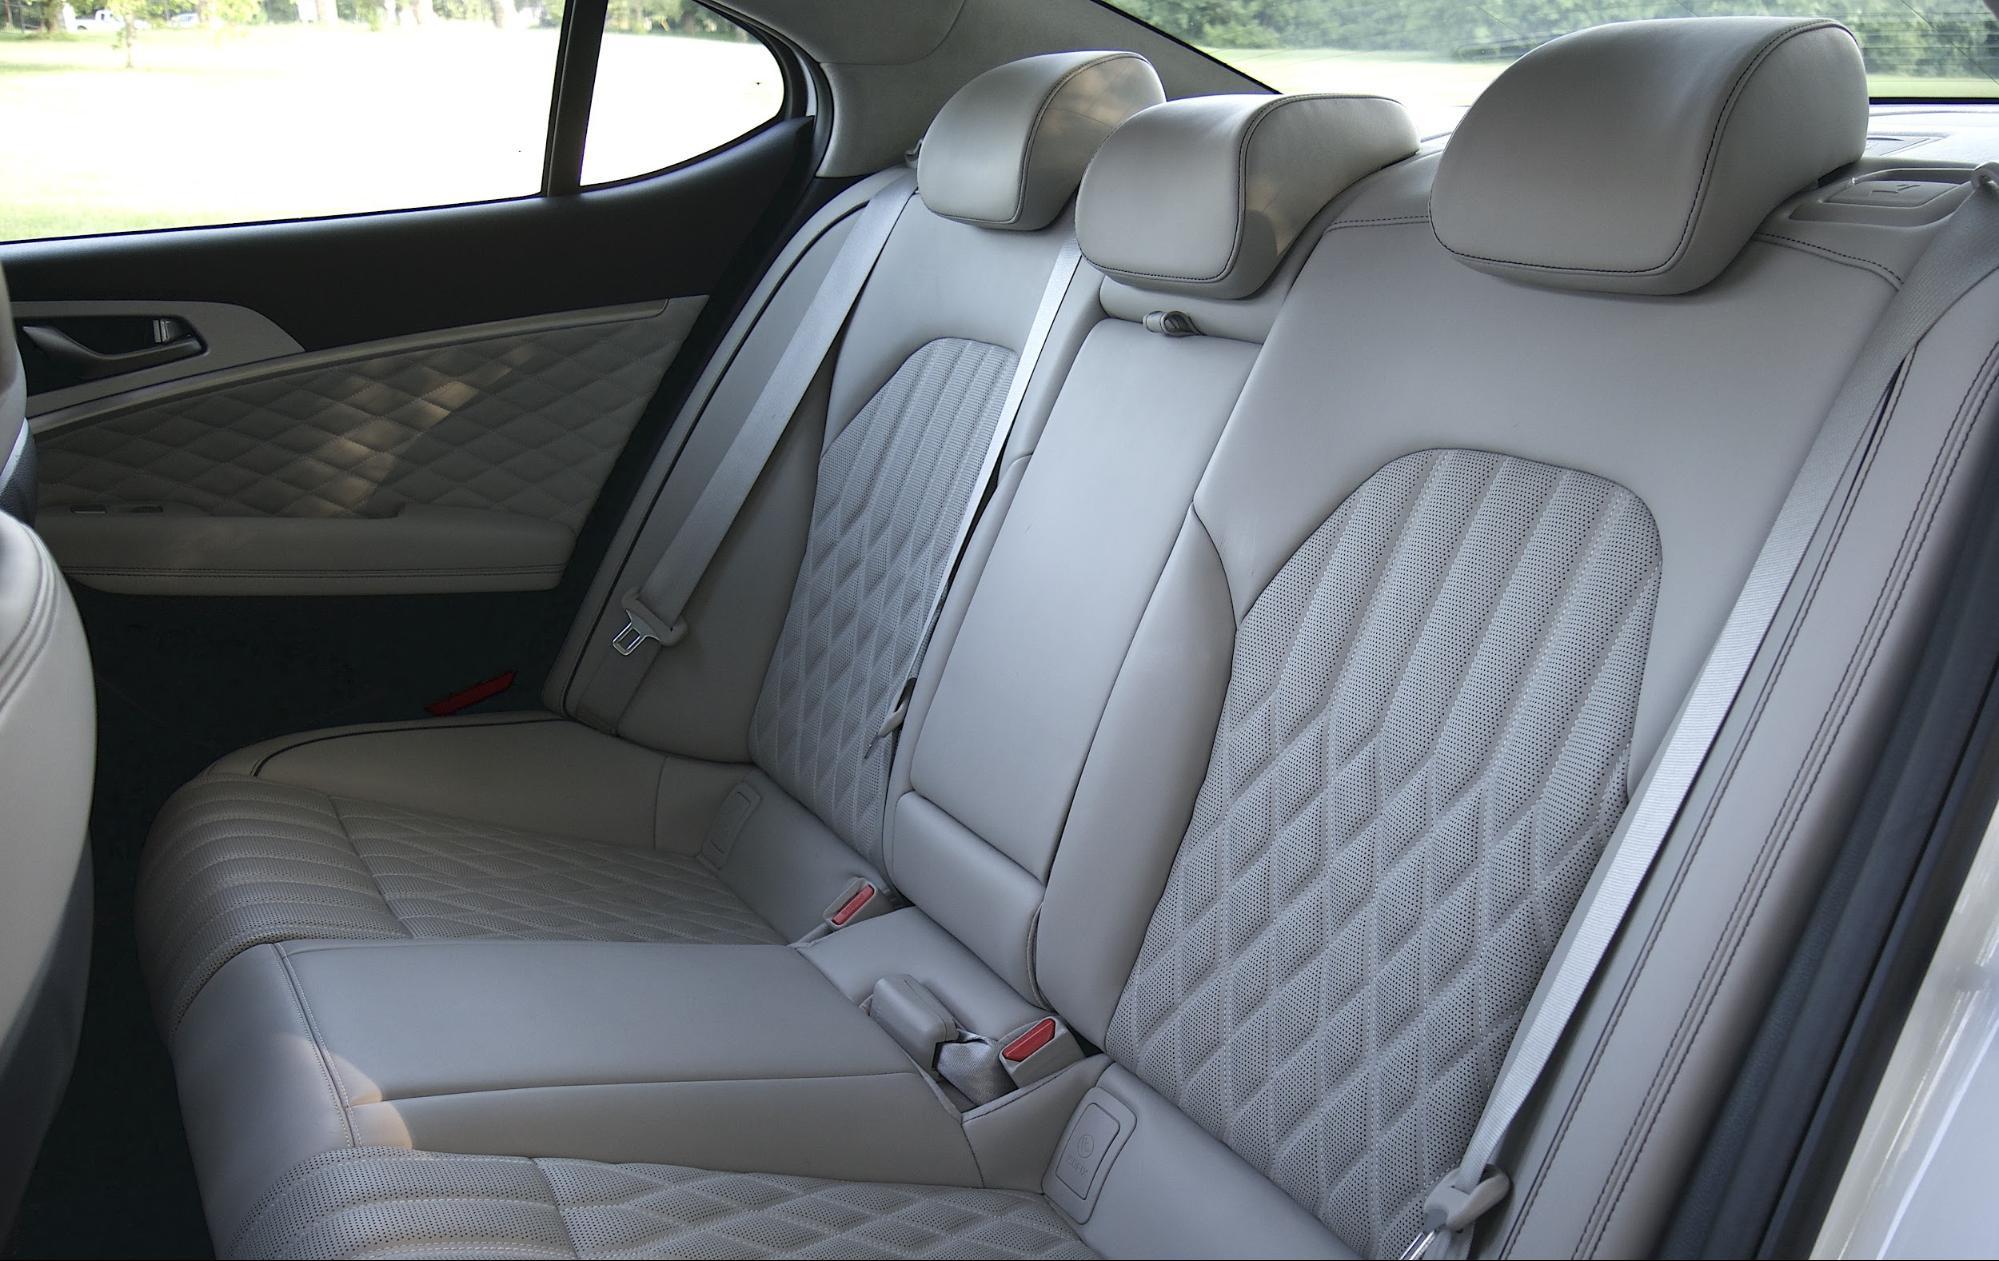 2020 Genesis G70 back seat